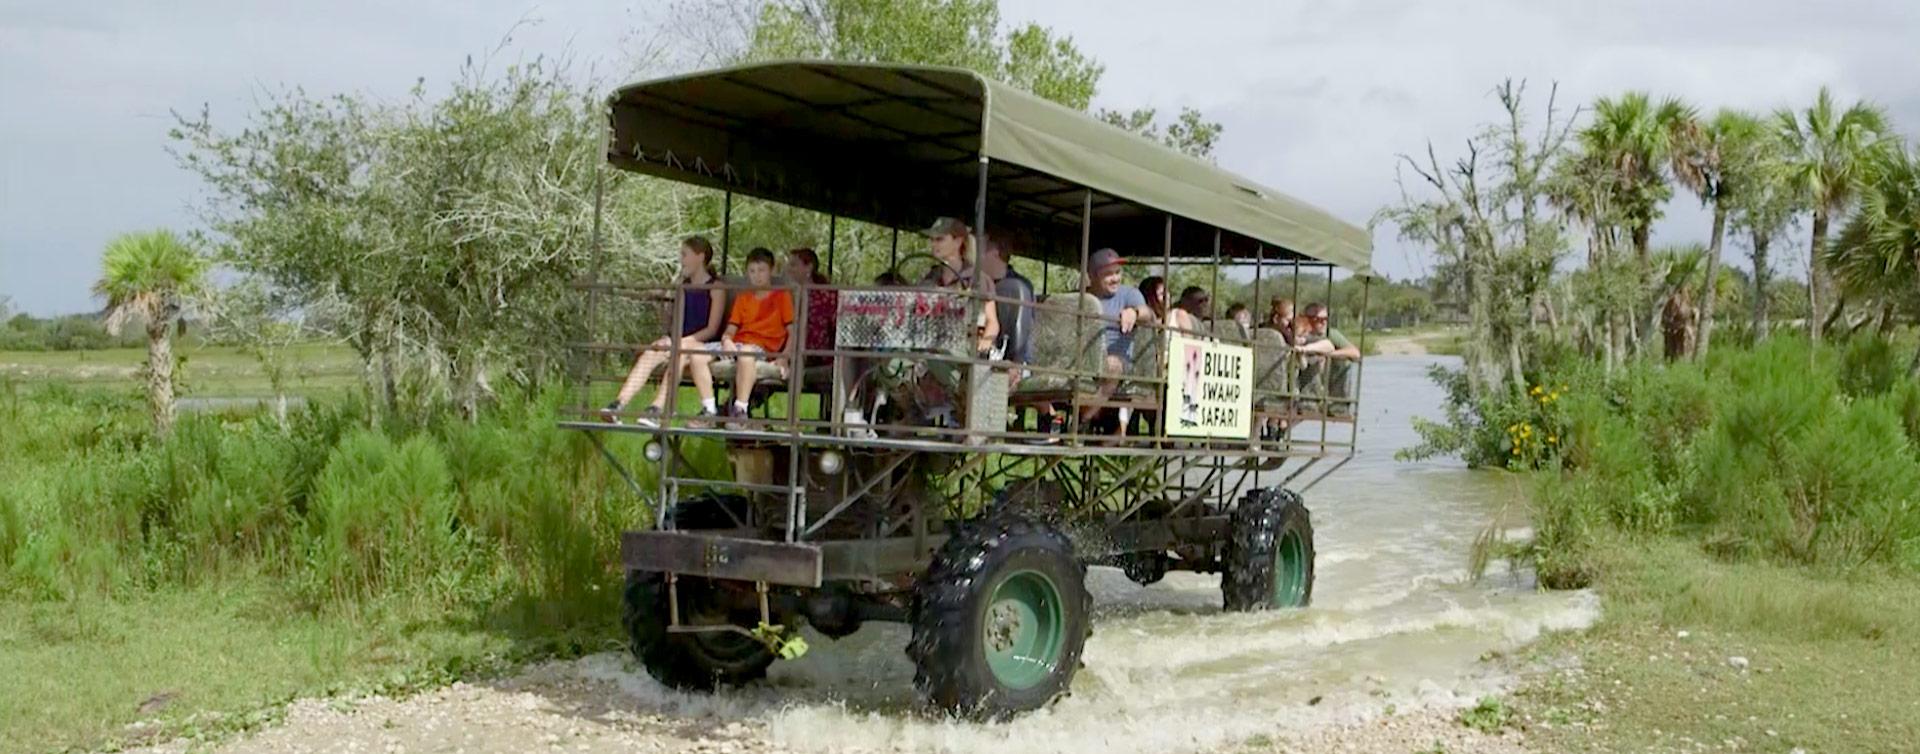 620007743 Swamp Buggy Eco Tour TEST - Billie Swamp SafariBillie Swamp Safari